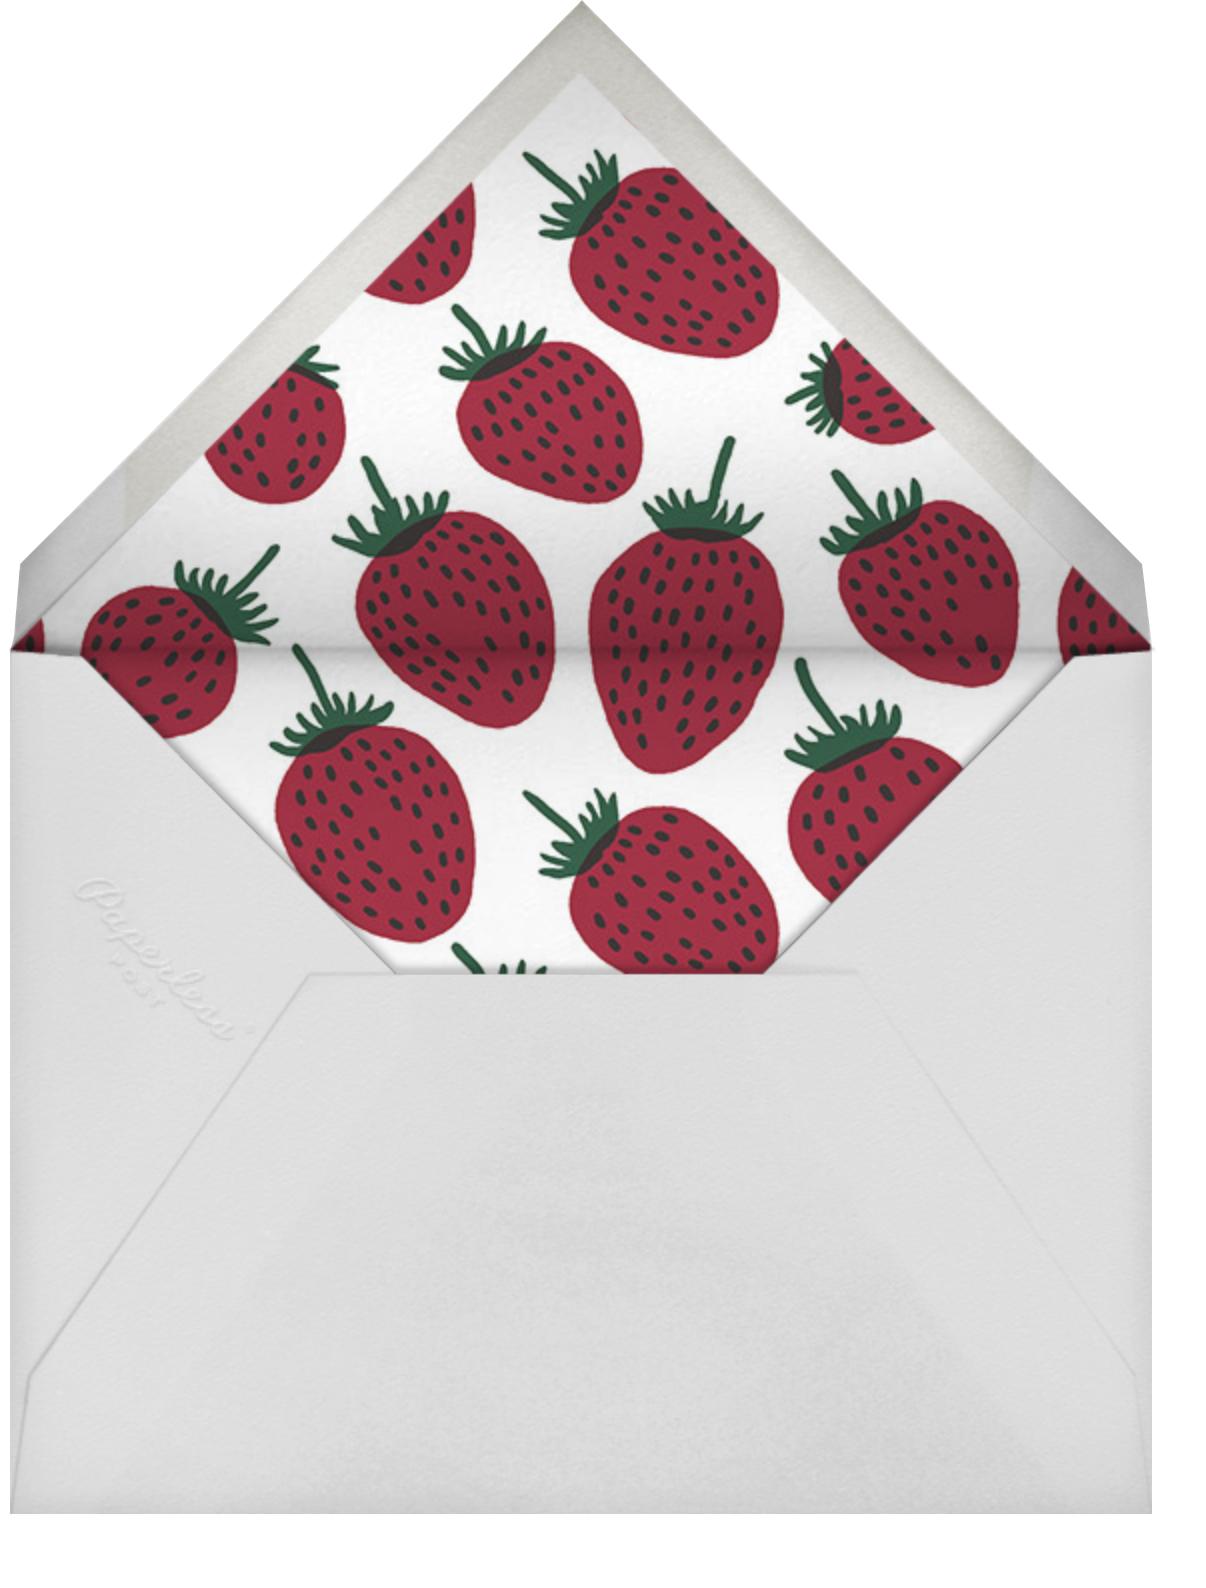 Pieni Mansikka - Marimekko - Brunch - envelope back